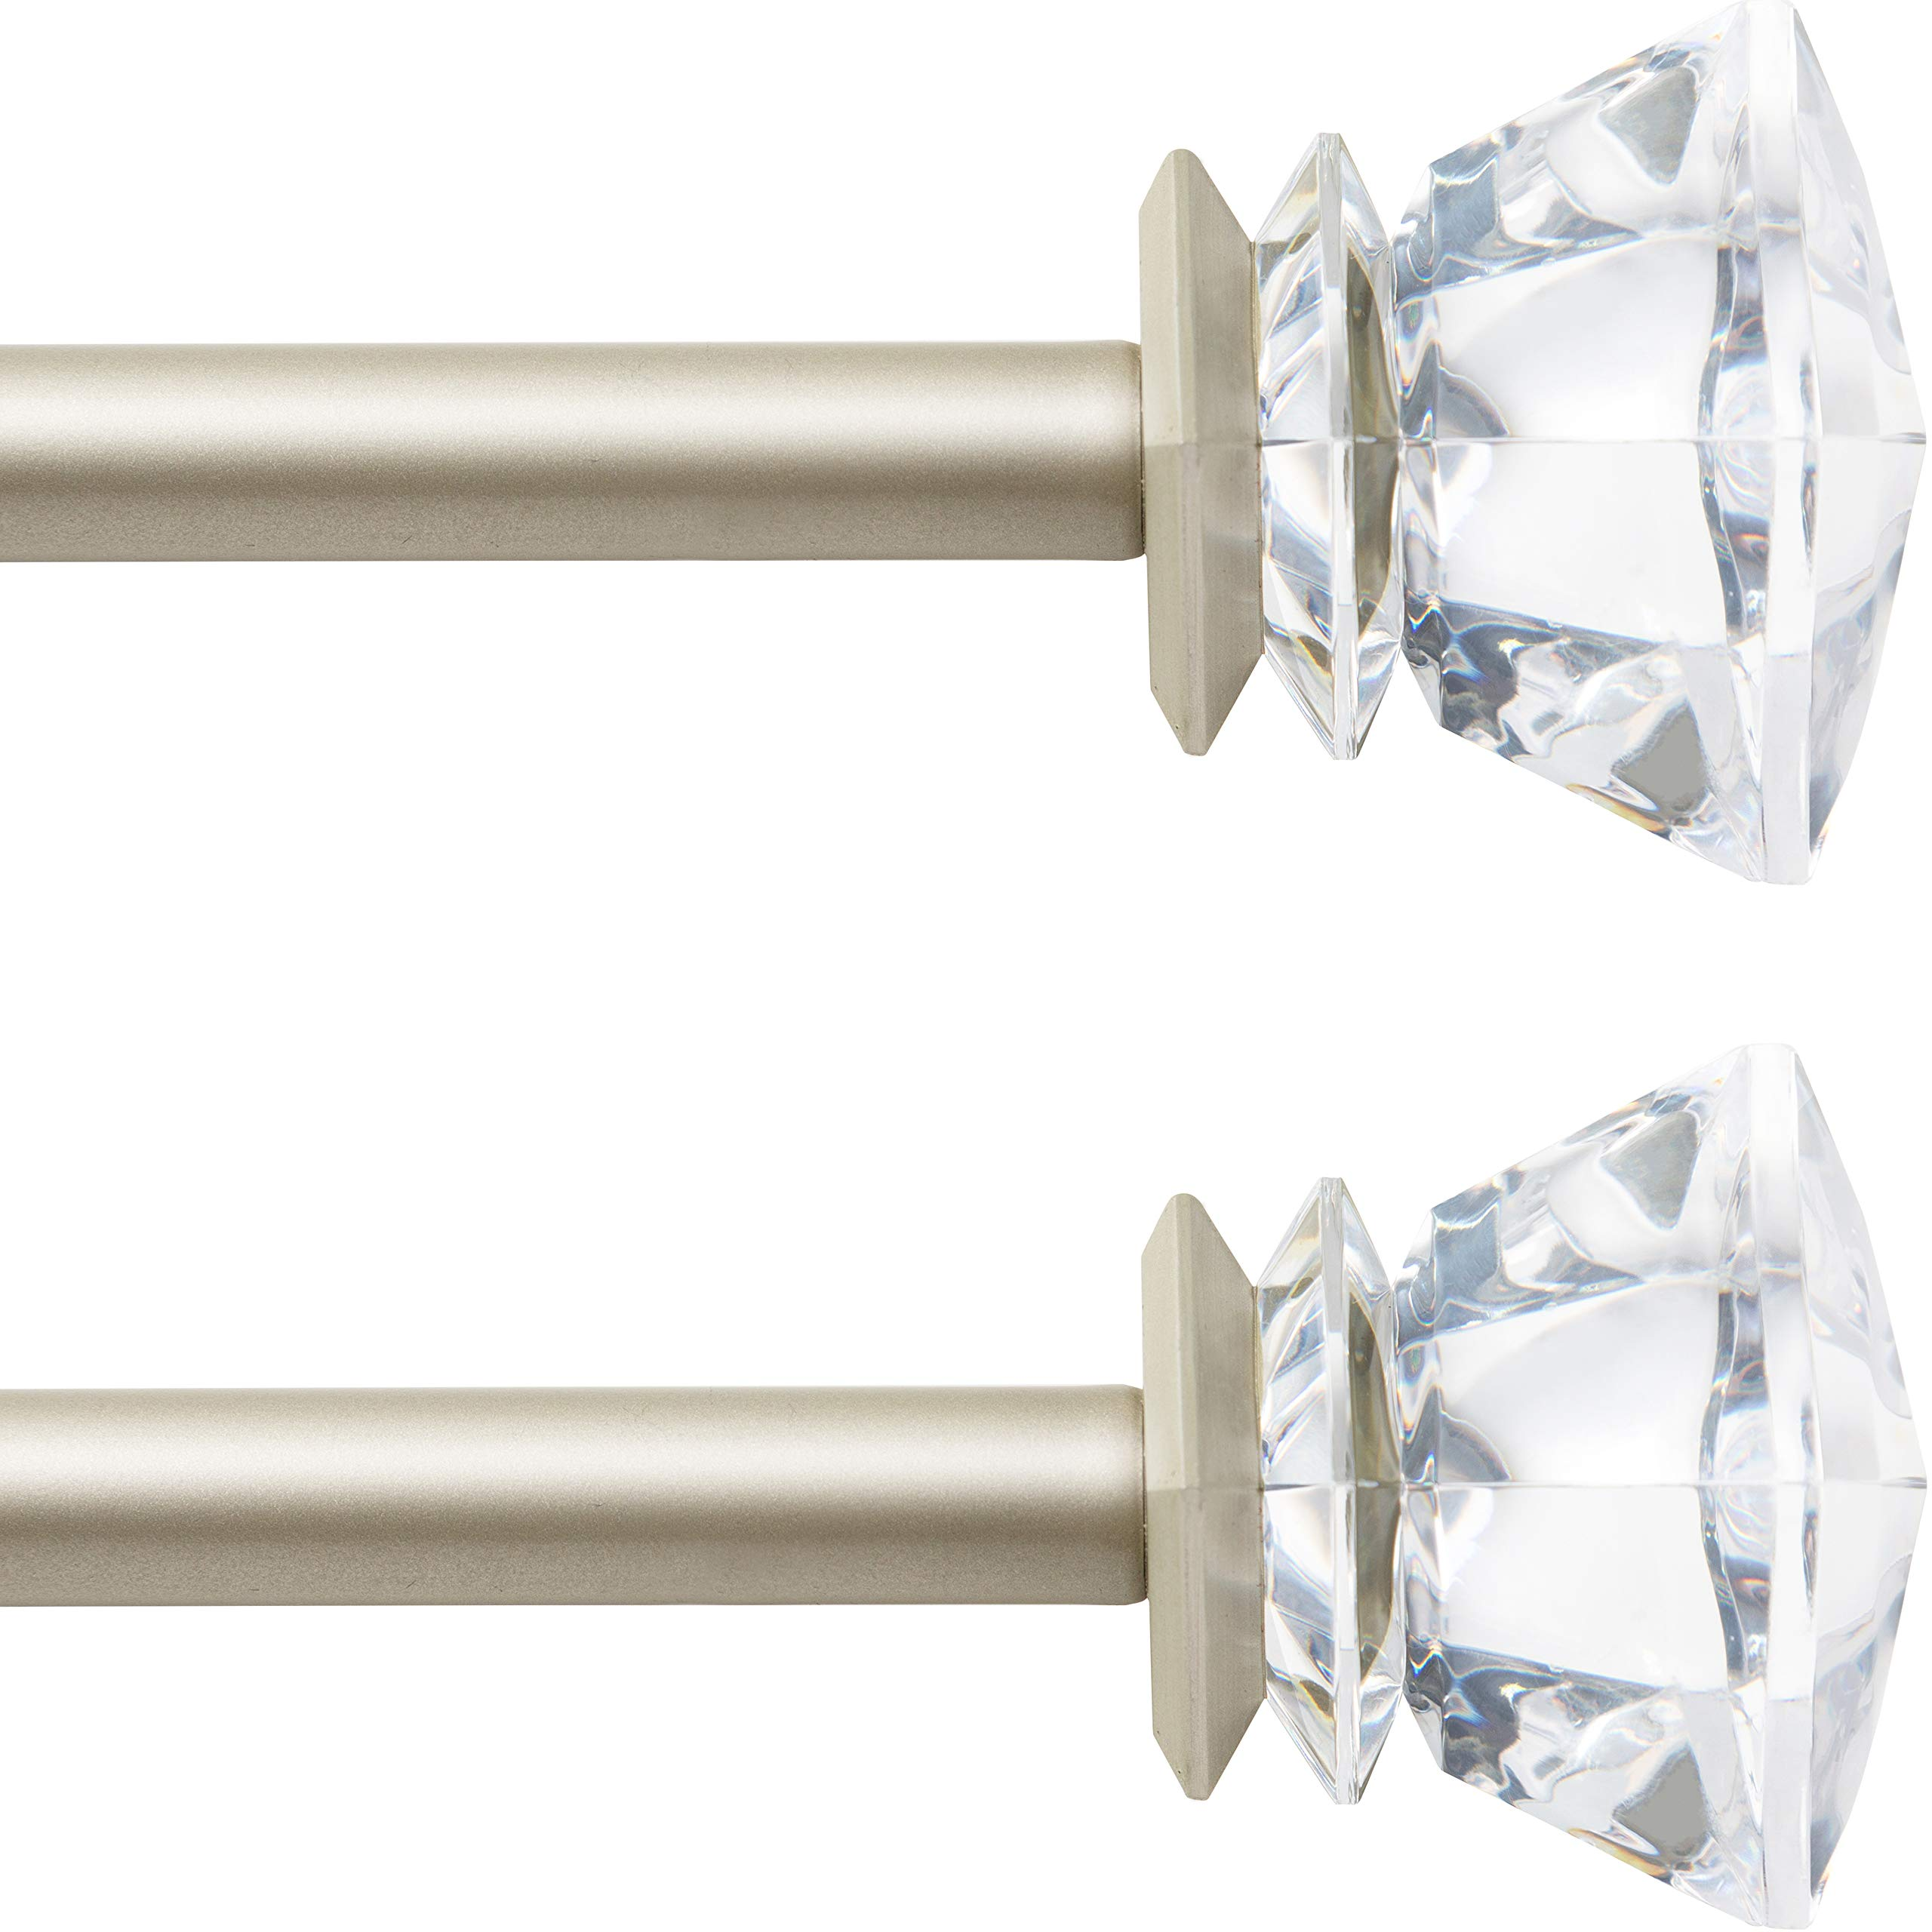 6//8 Inch Curtain Rods Single Window Rod Acrylic Diamond Finials Black 2 Colors